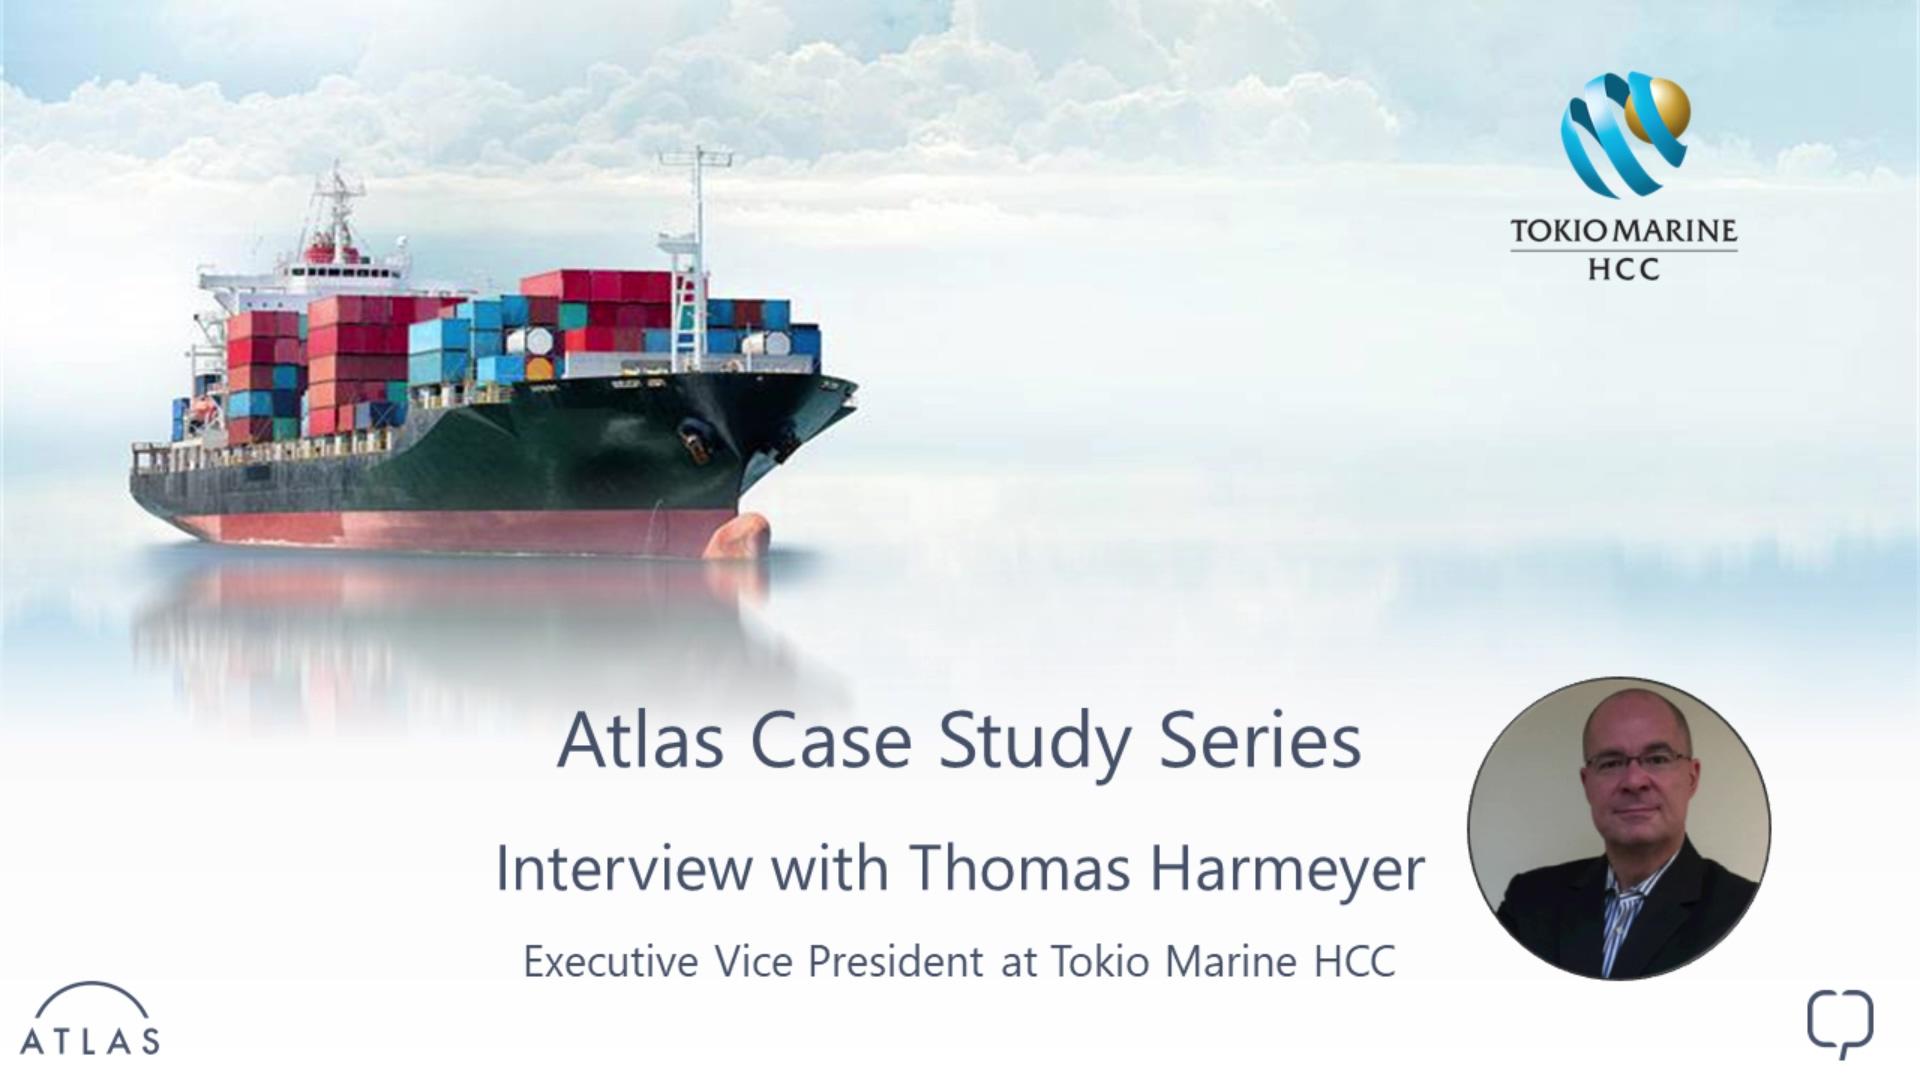 TMHCC-Global Case Study - Thomas Harmeyer - No1 - Describe Atlas